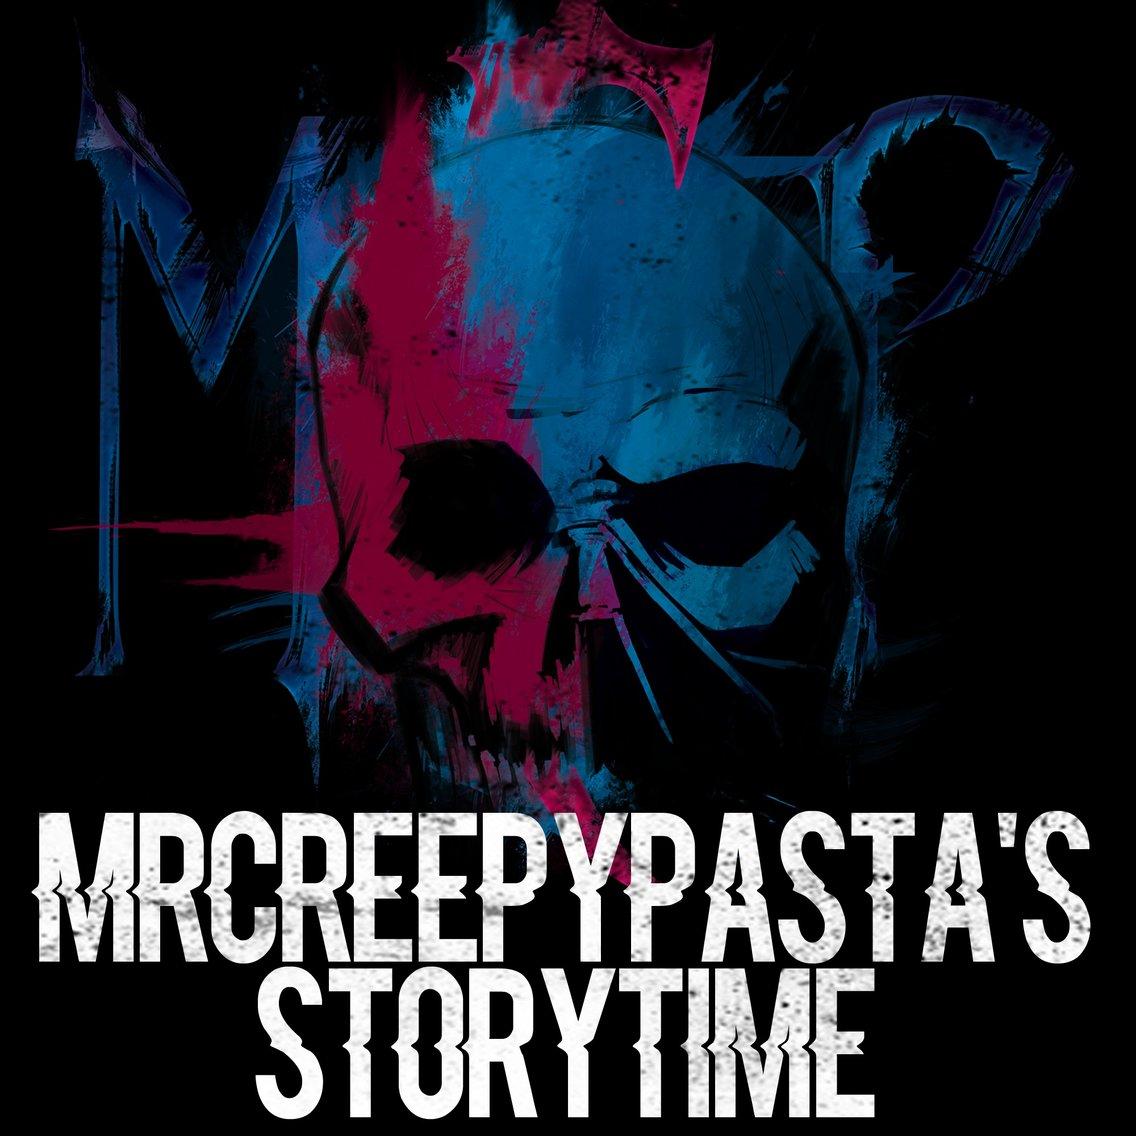 MrCreepyPasta's Storytime - Cover Image